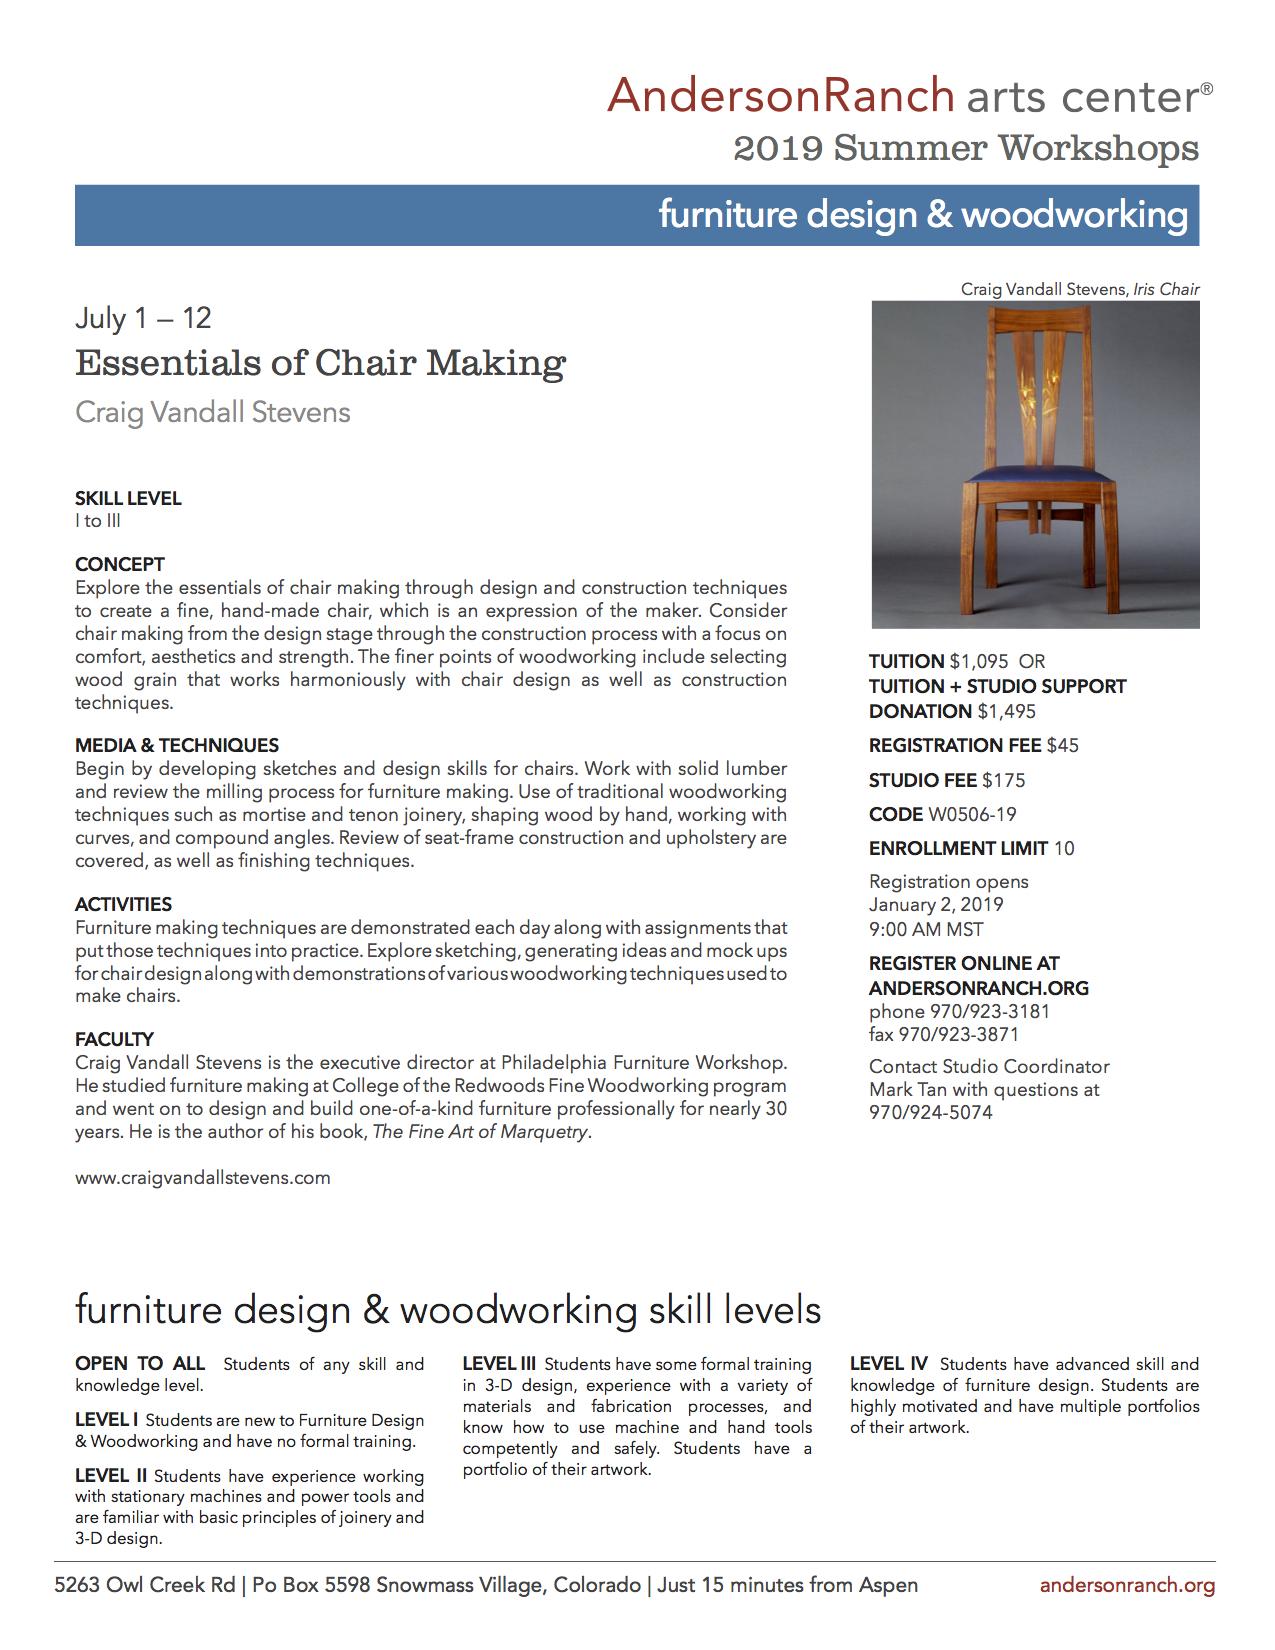 Essentials of Chair Making.jpeg